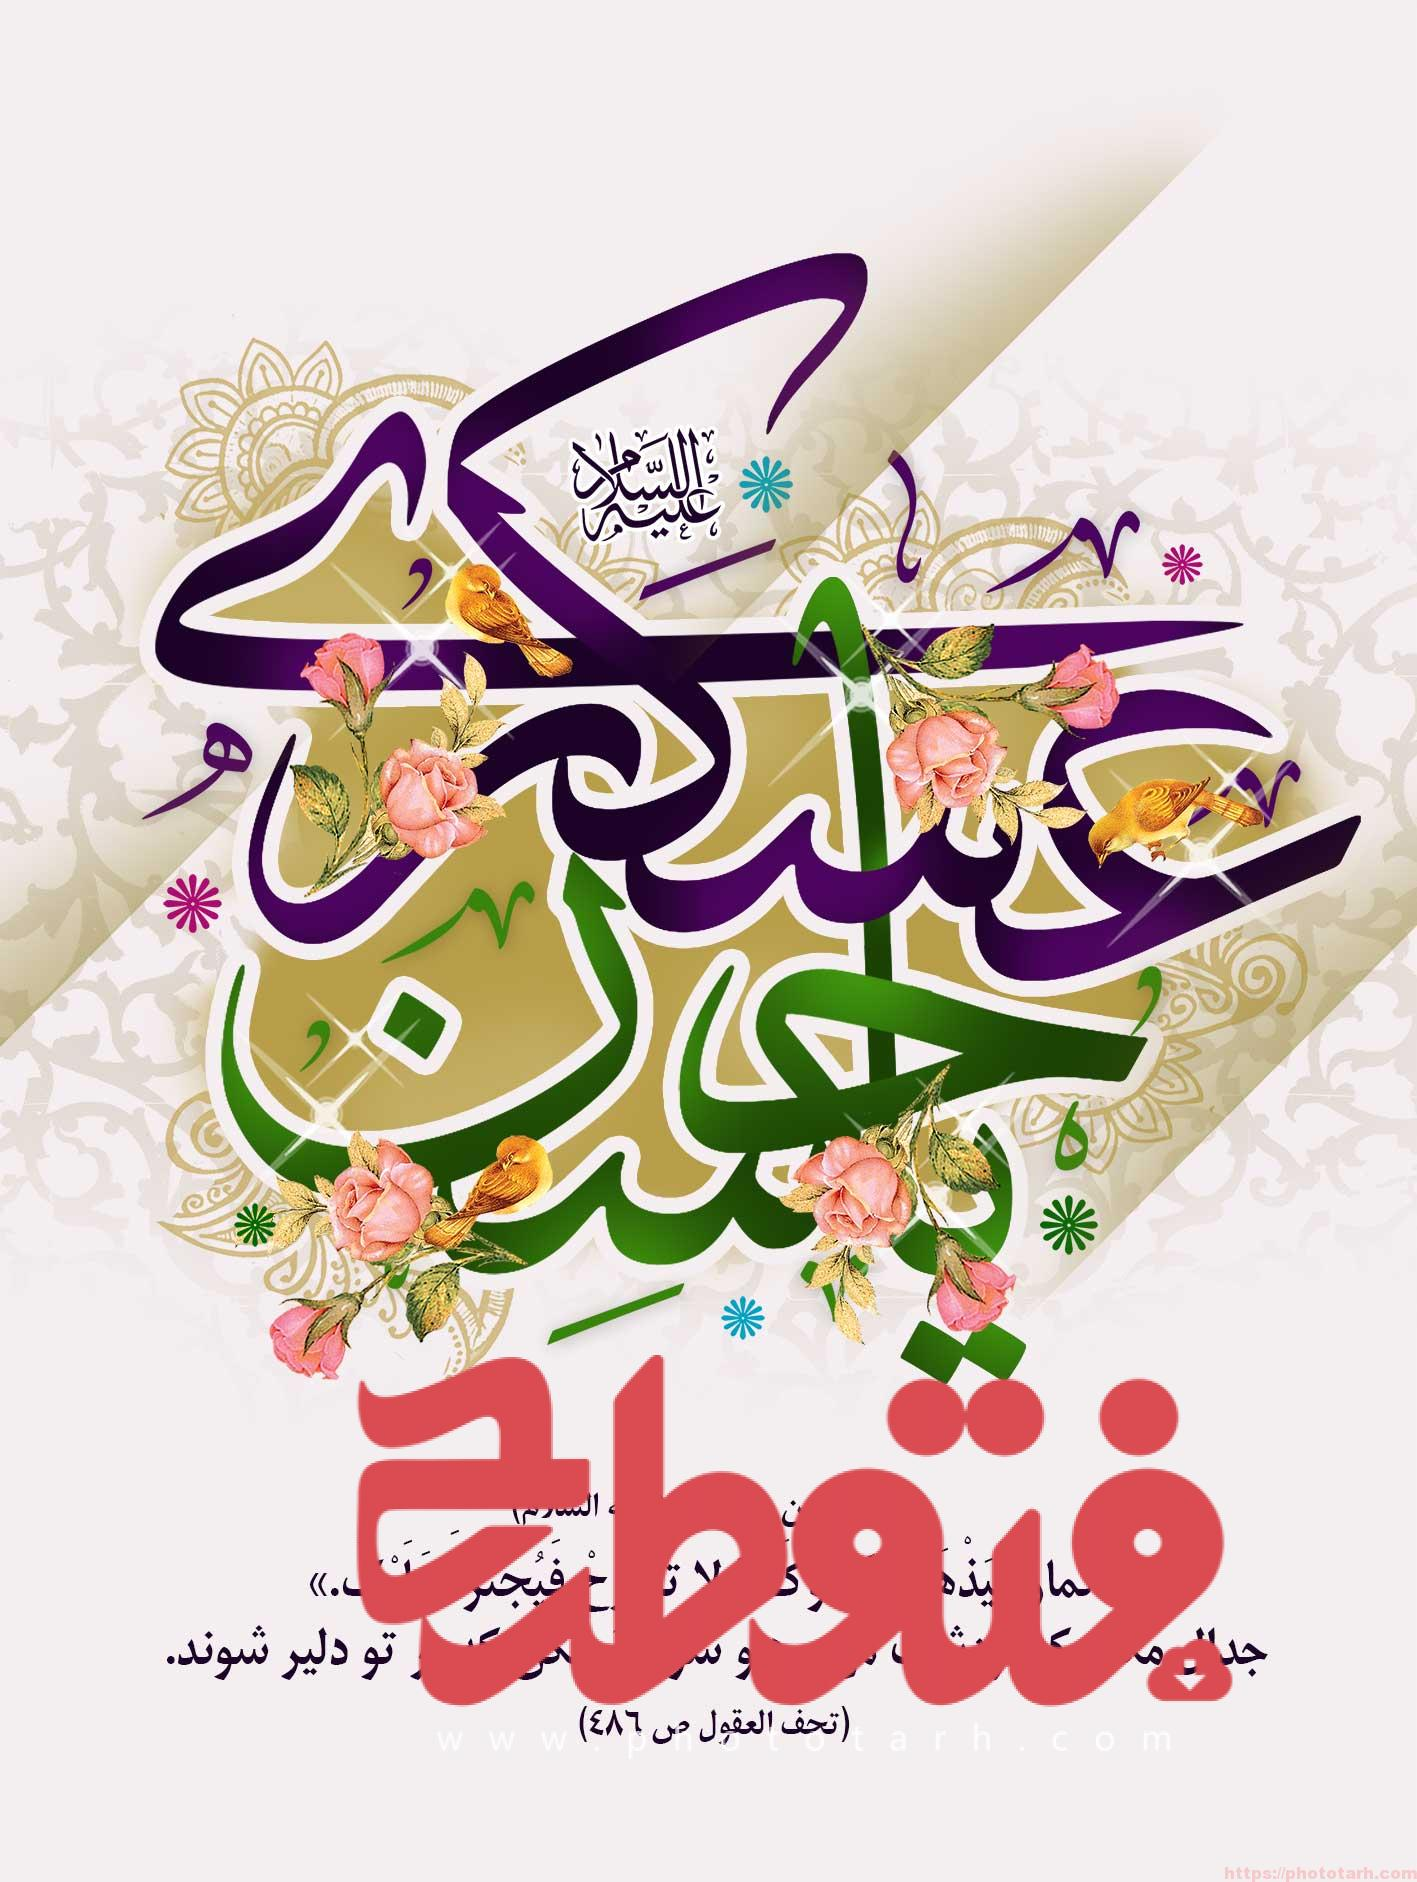 Avea94 - پوستر لایه باز ولادت امام حسن عسکری علیه السلام